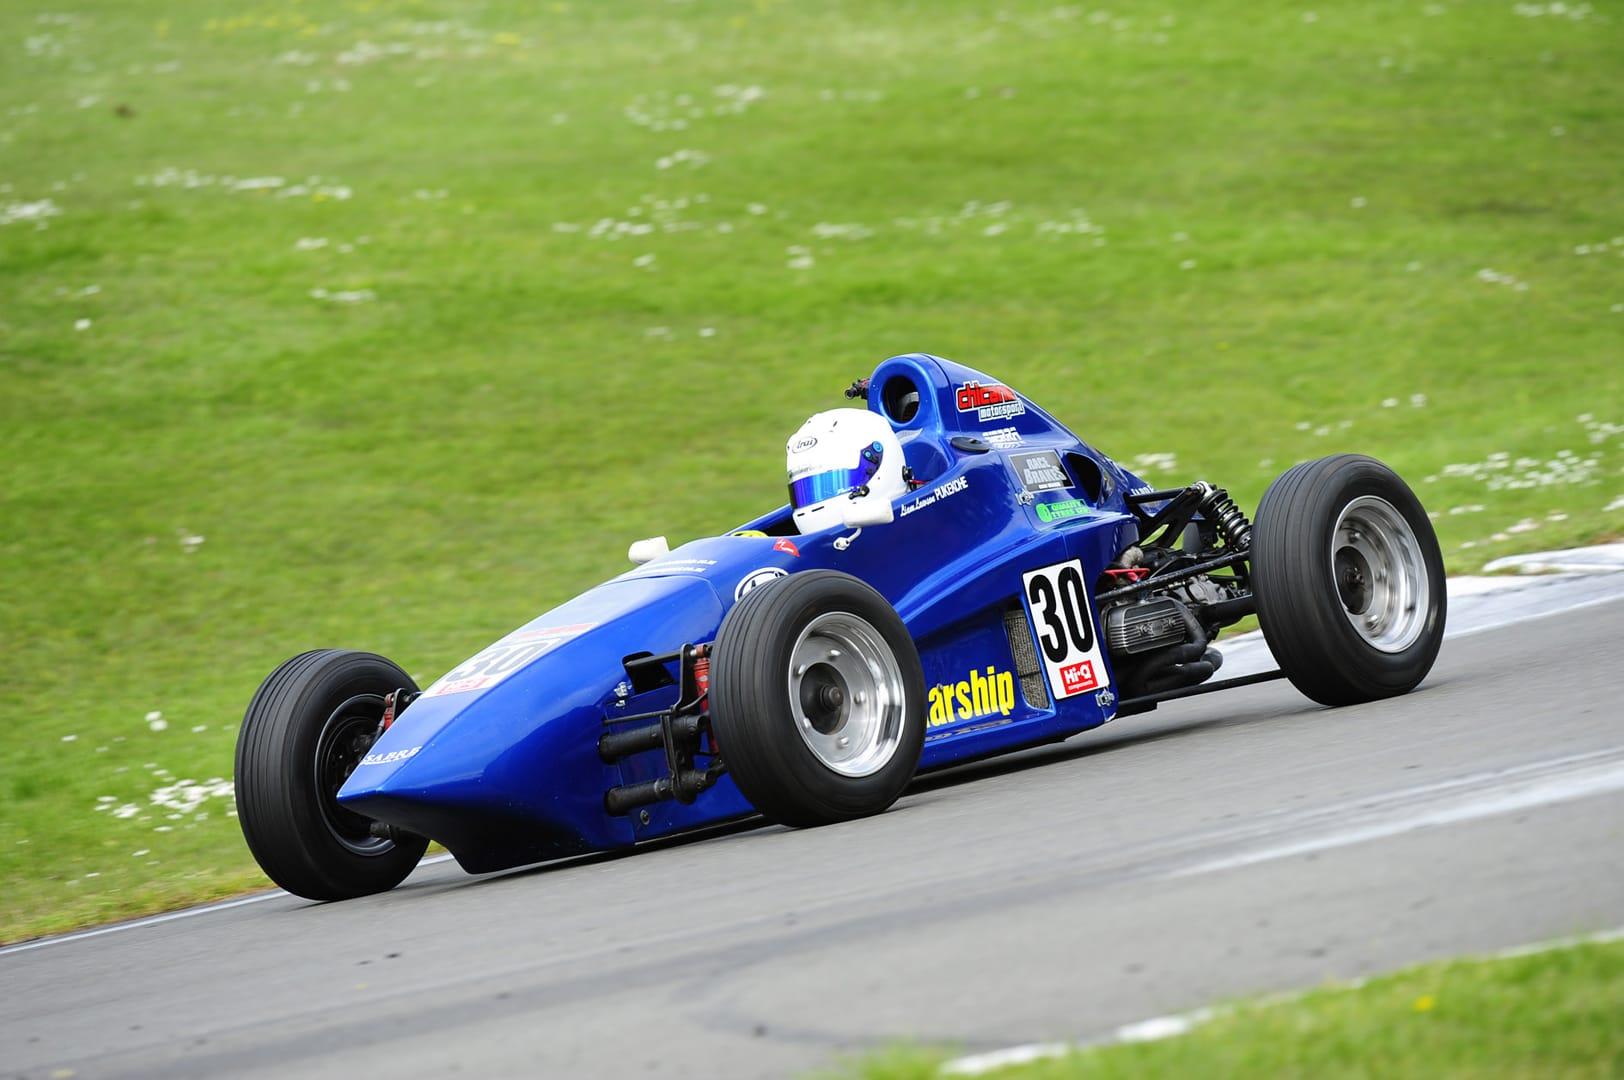 Lawson wins first championship race